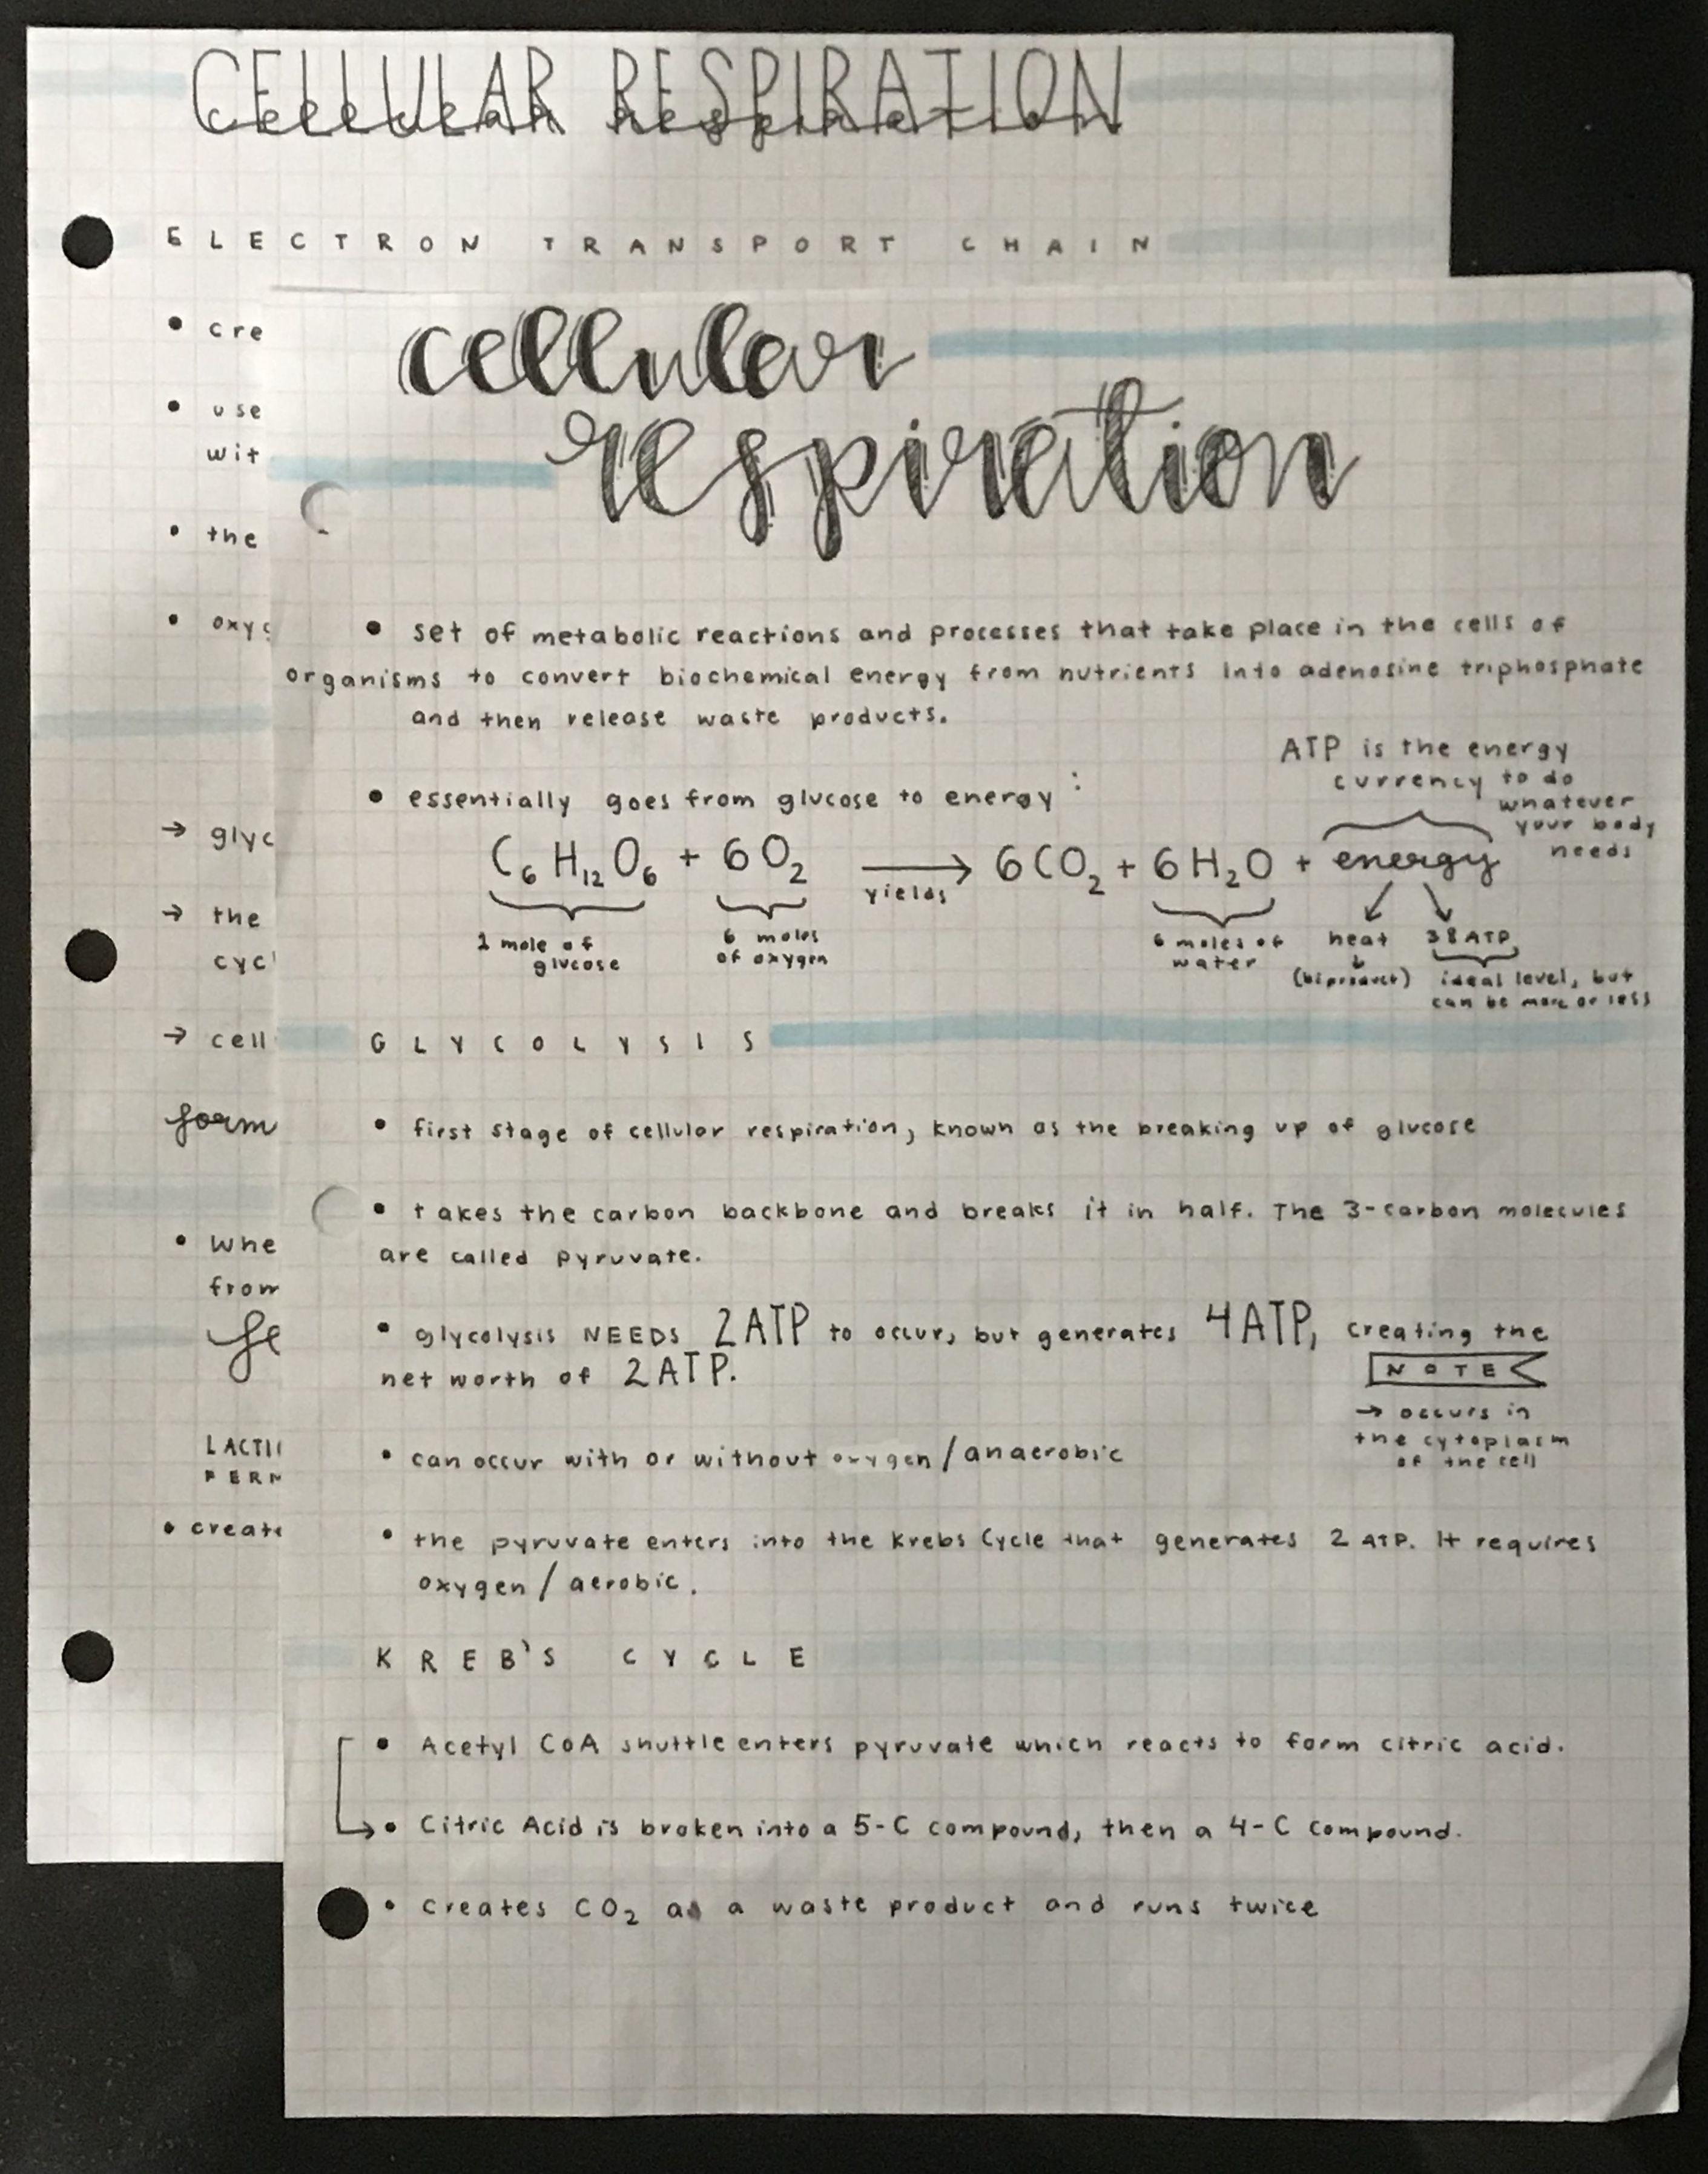 Aesthetic Notes Gcse Science Revision School Goals School Organization [ 3590 x 2821 Pixel ]